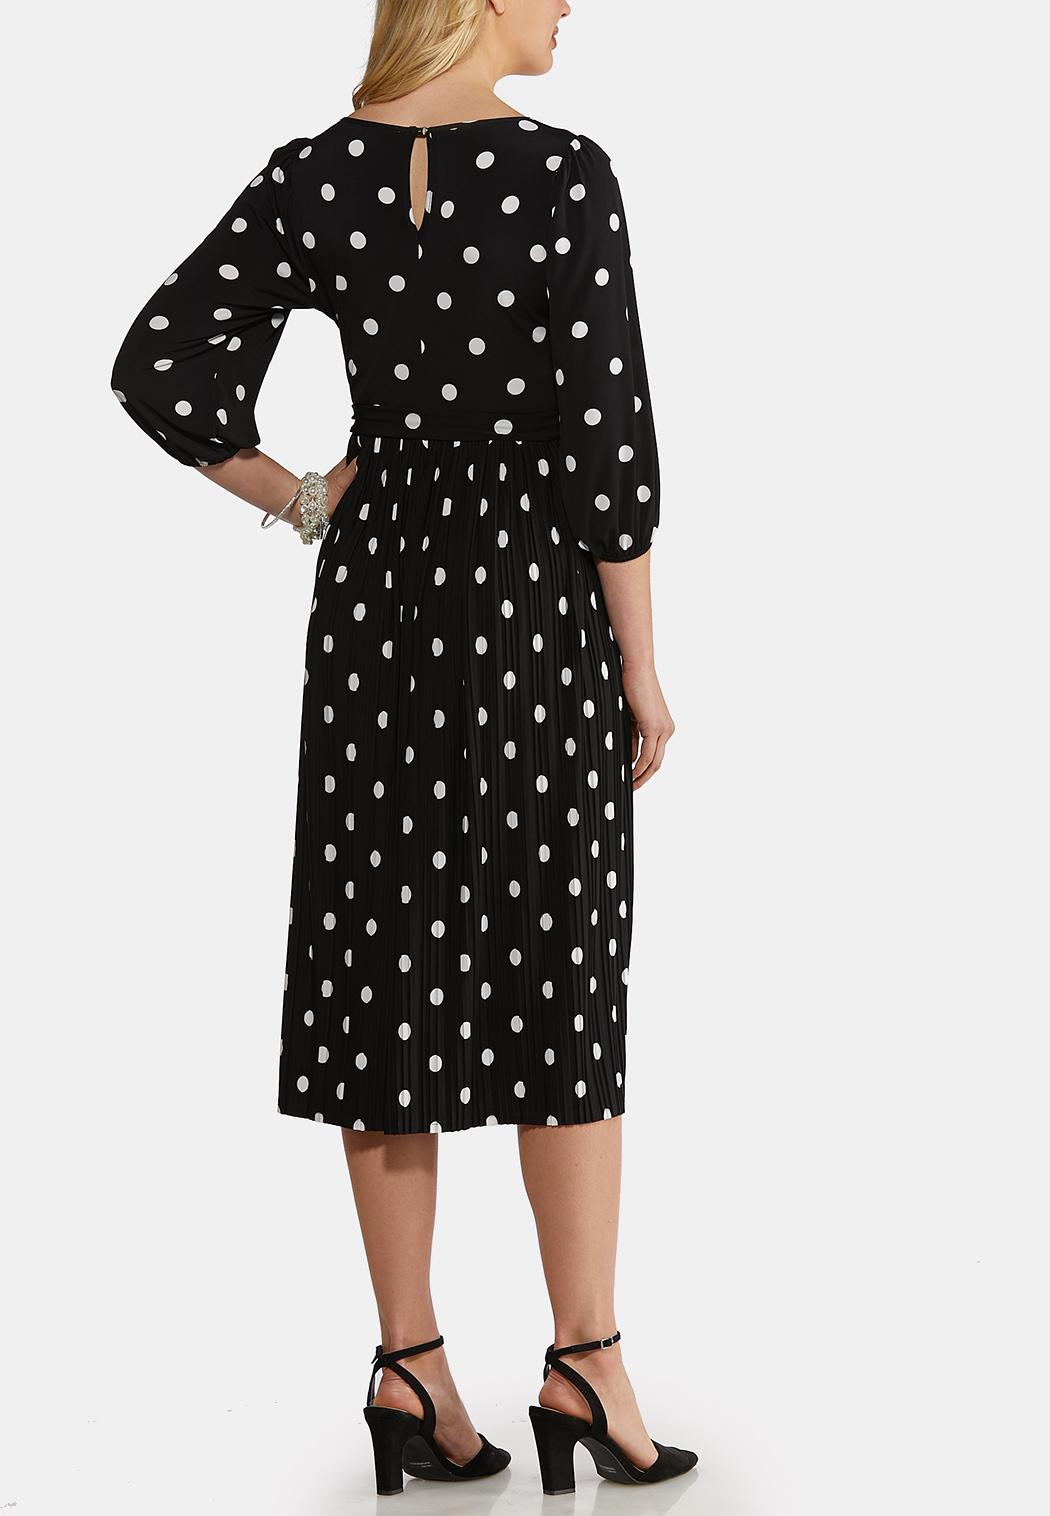 Plus Size Black White Polka Dot Dress (Item #44166465)